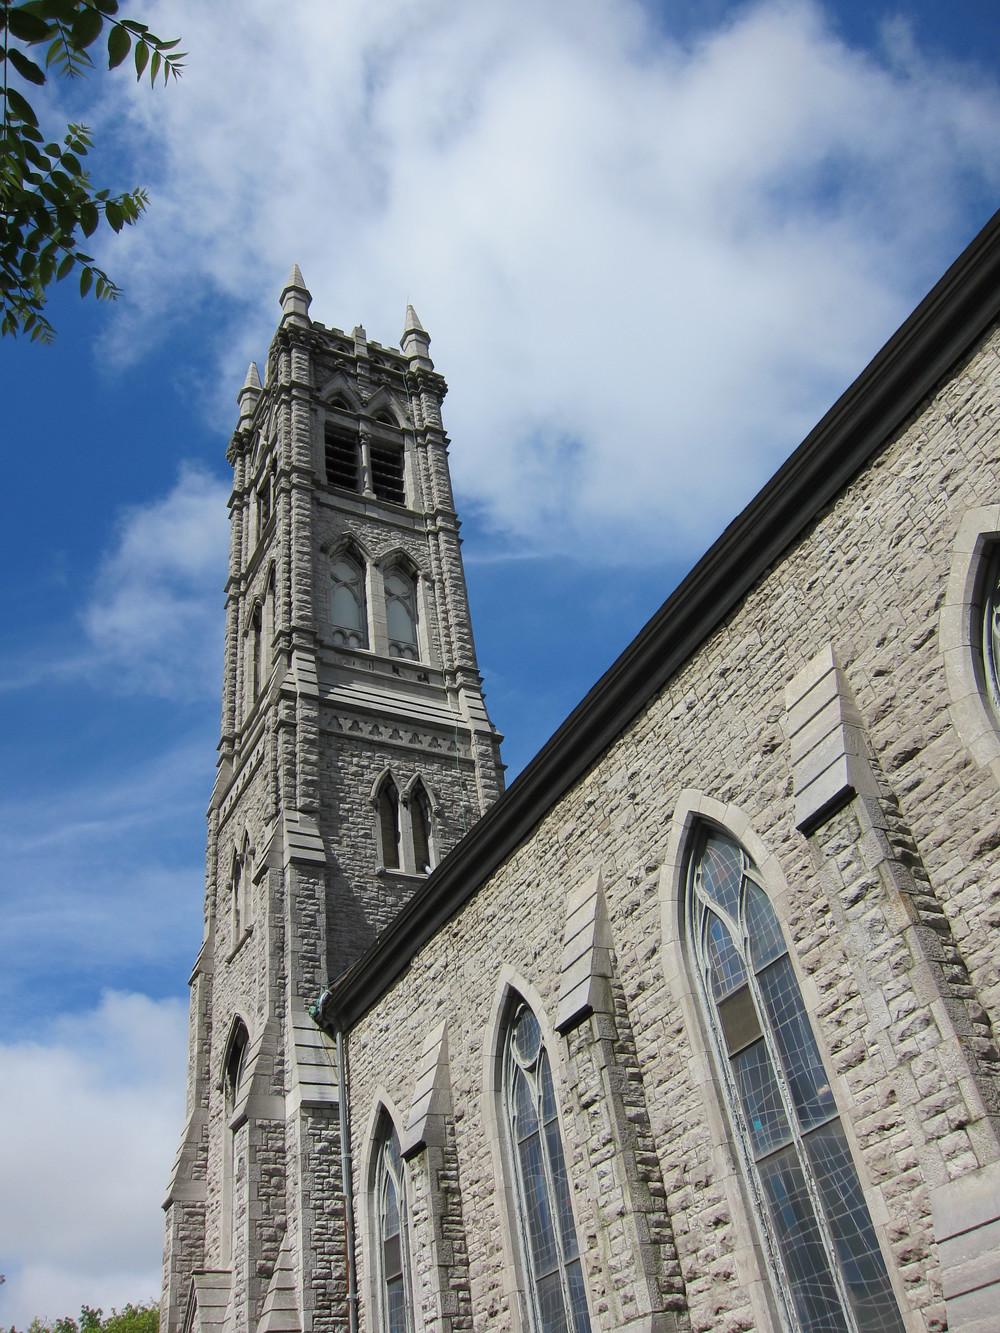 Emmanuel Baptist Church at 275 State Street